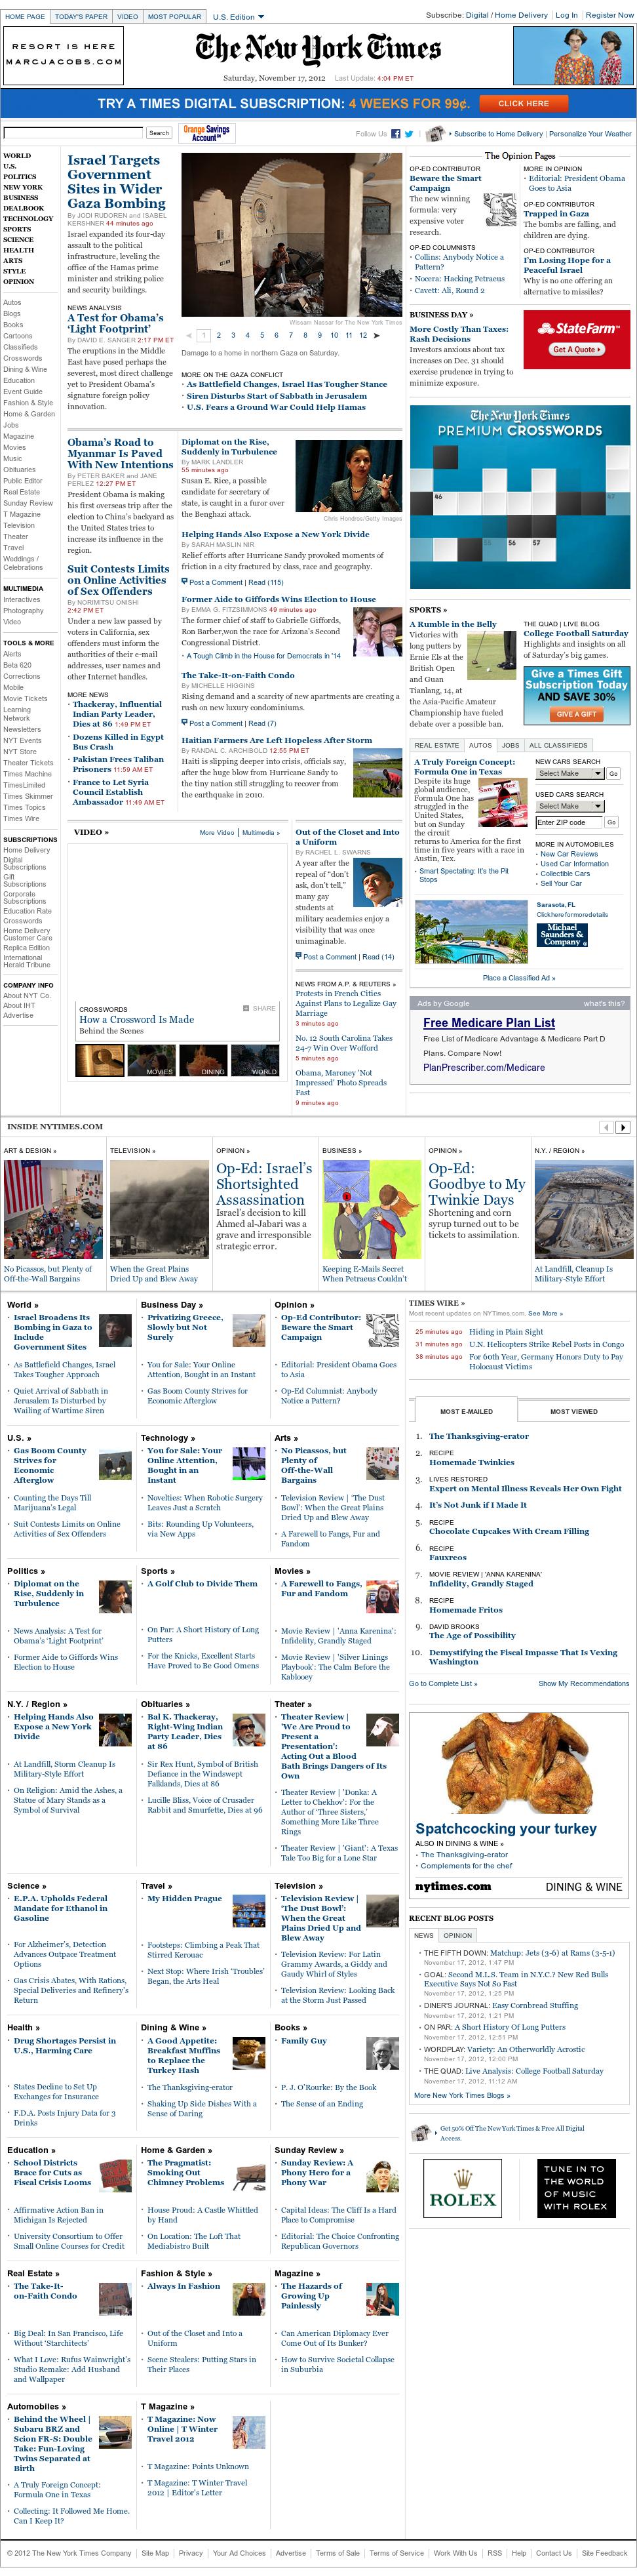 The New York Times at Saturday Nov. 17, 2012, 9:22 p.m. UTC